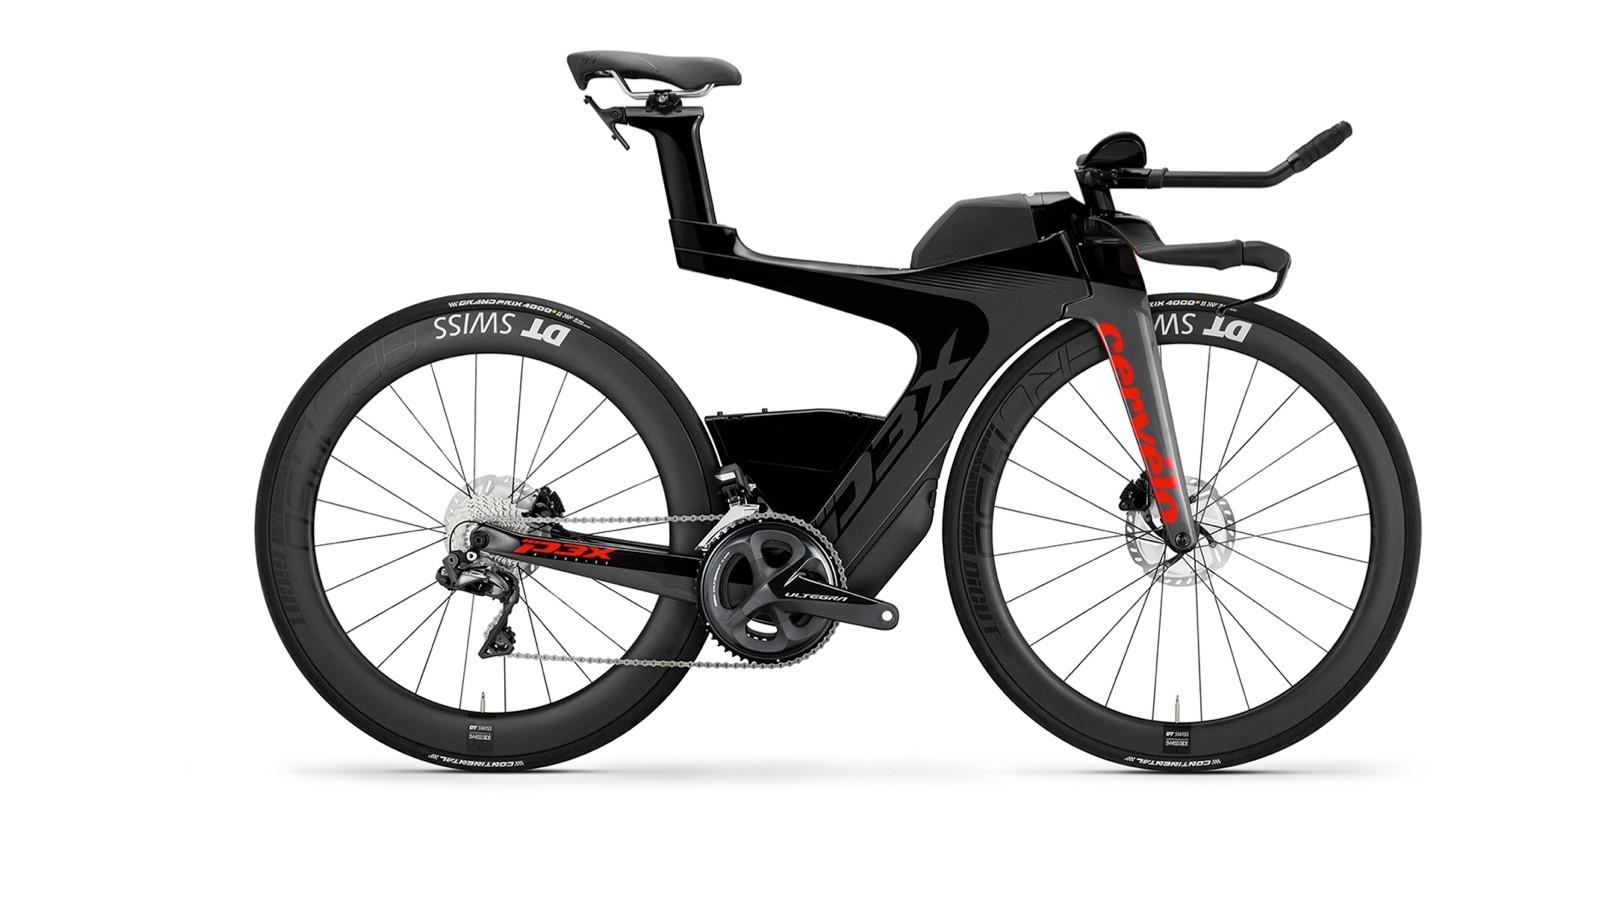 The new Cervelo P3X triathlon bike